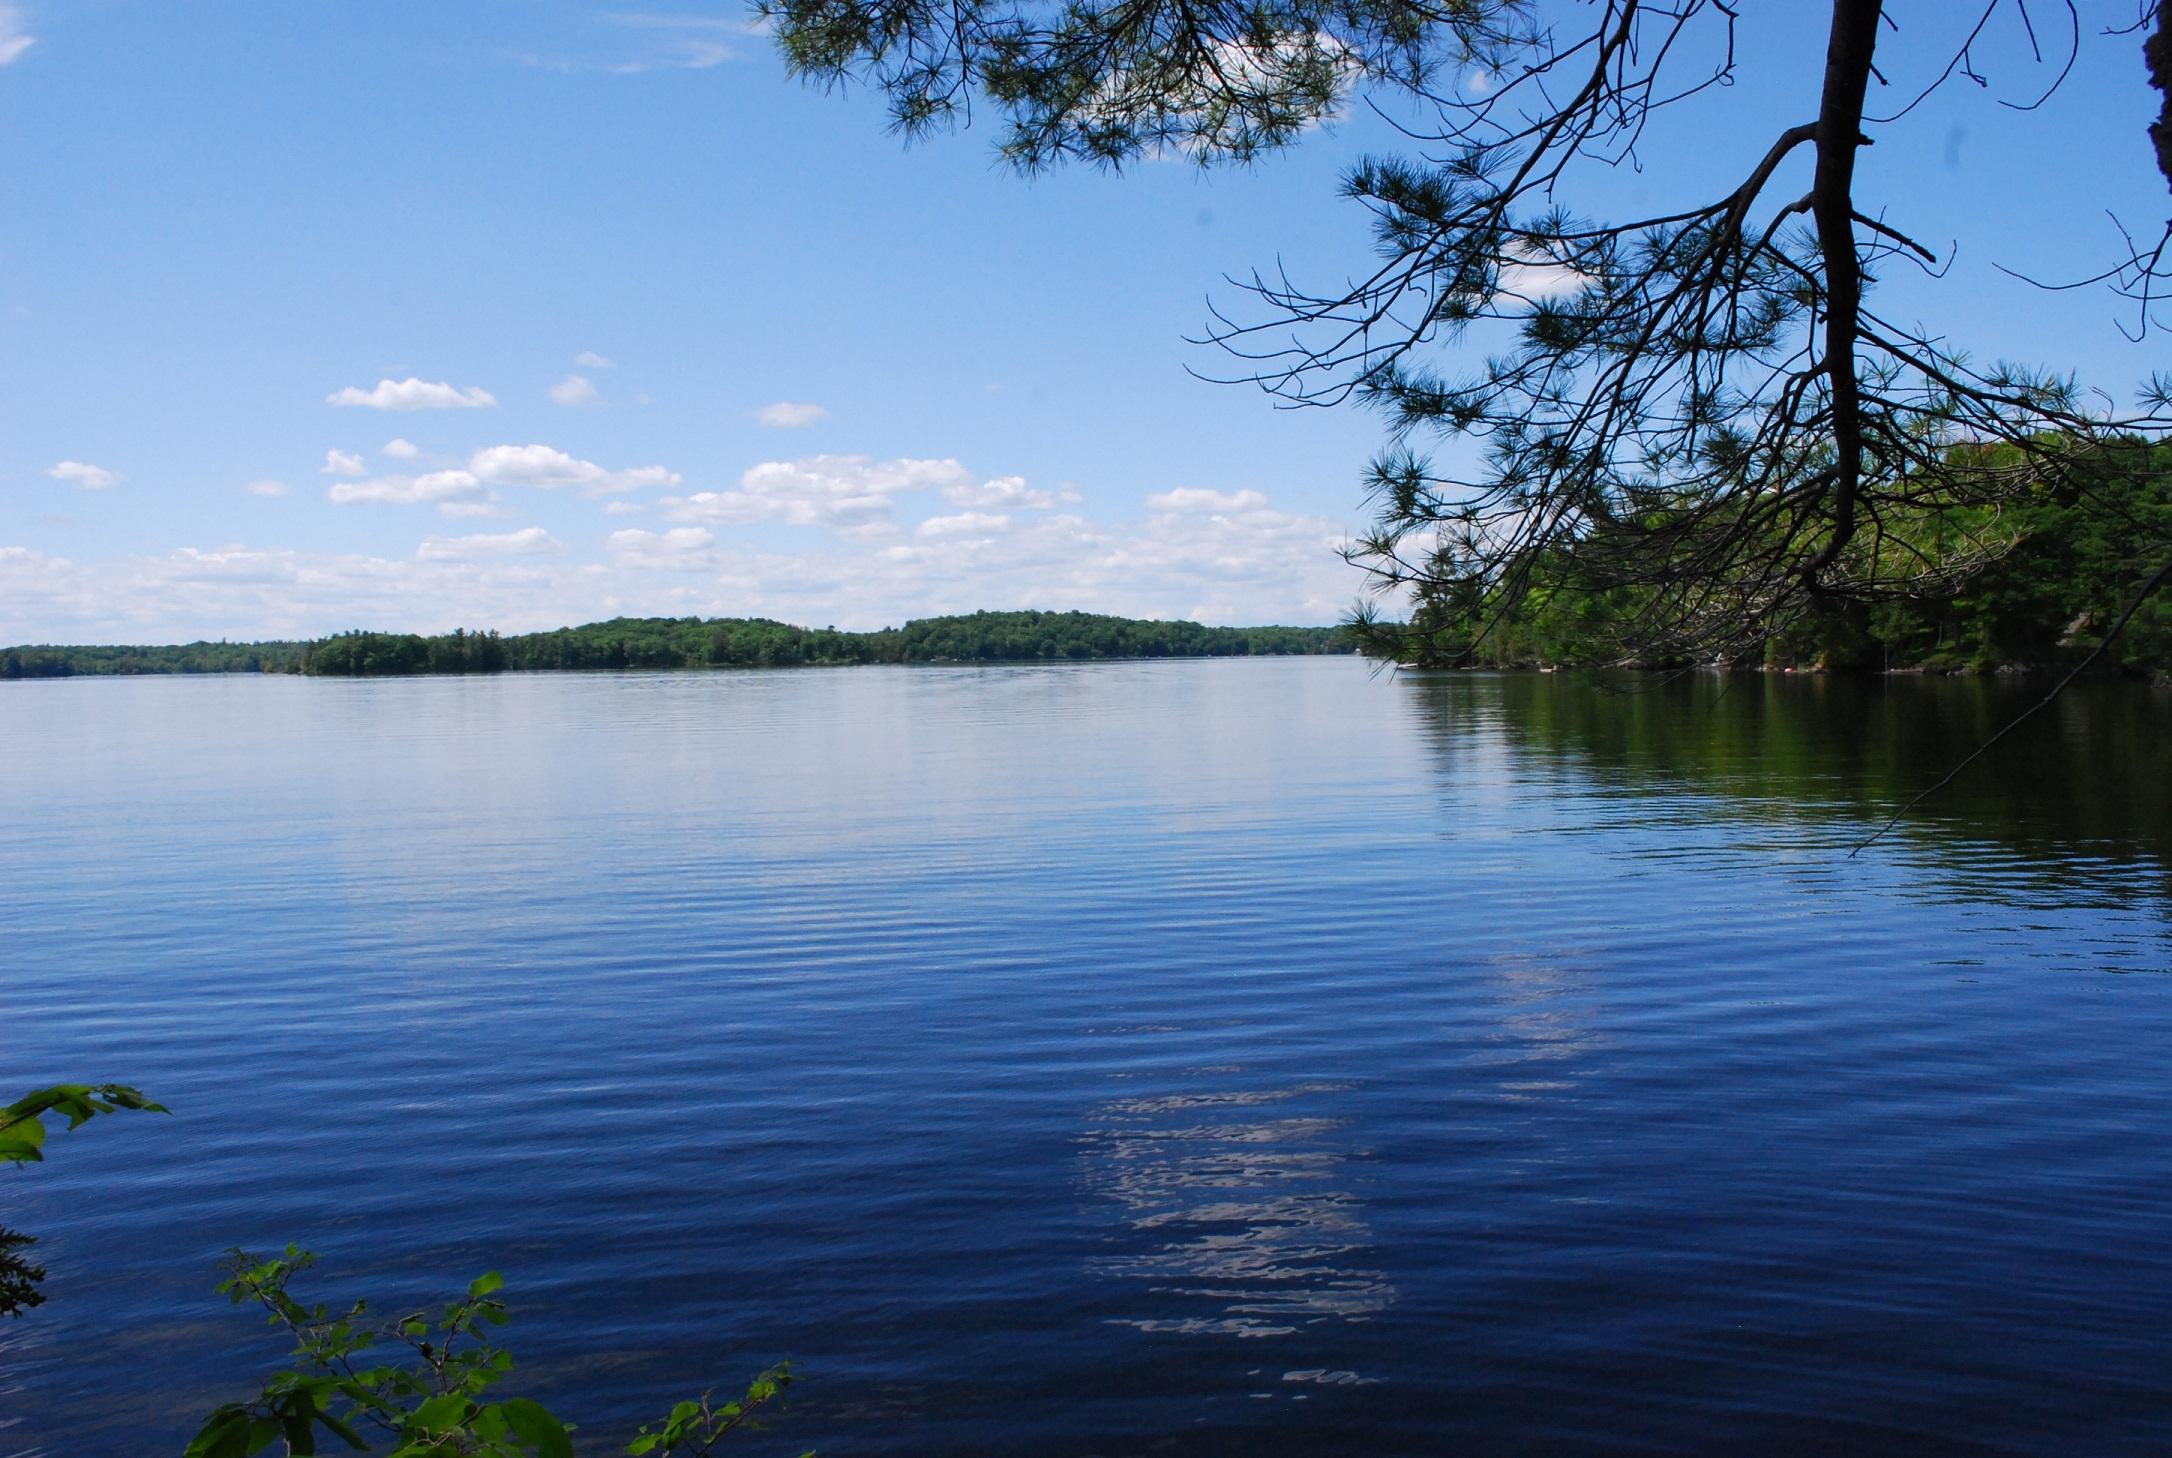 Pine Lane, Bobs Lake, Godfrey Ontario, Canada